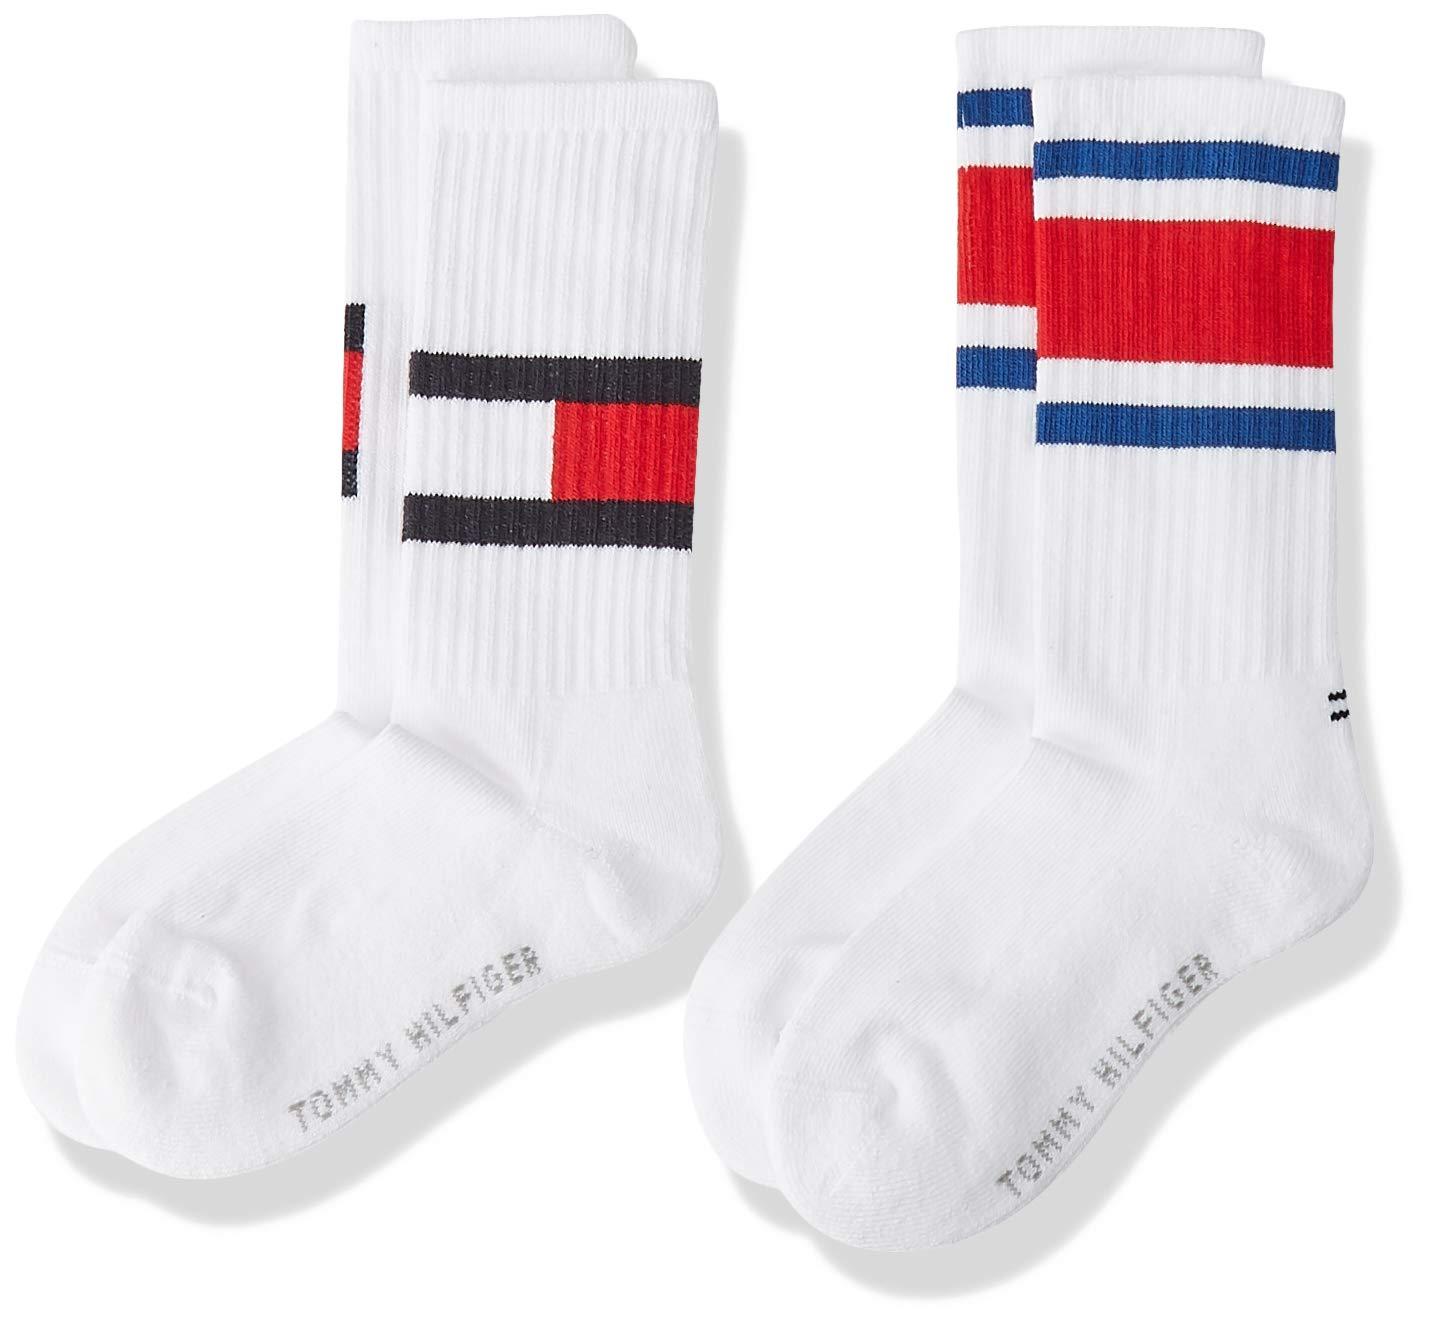 Tommy Hilfiger Boys Calf Socks Pack of 2